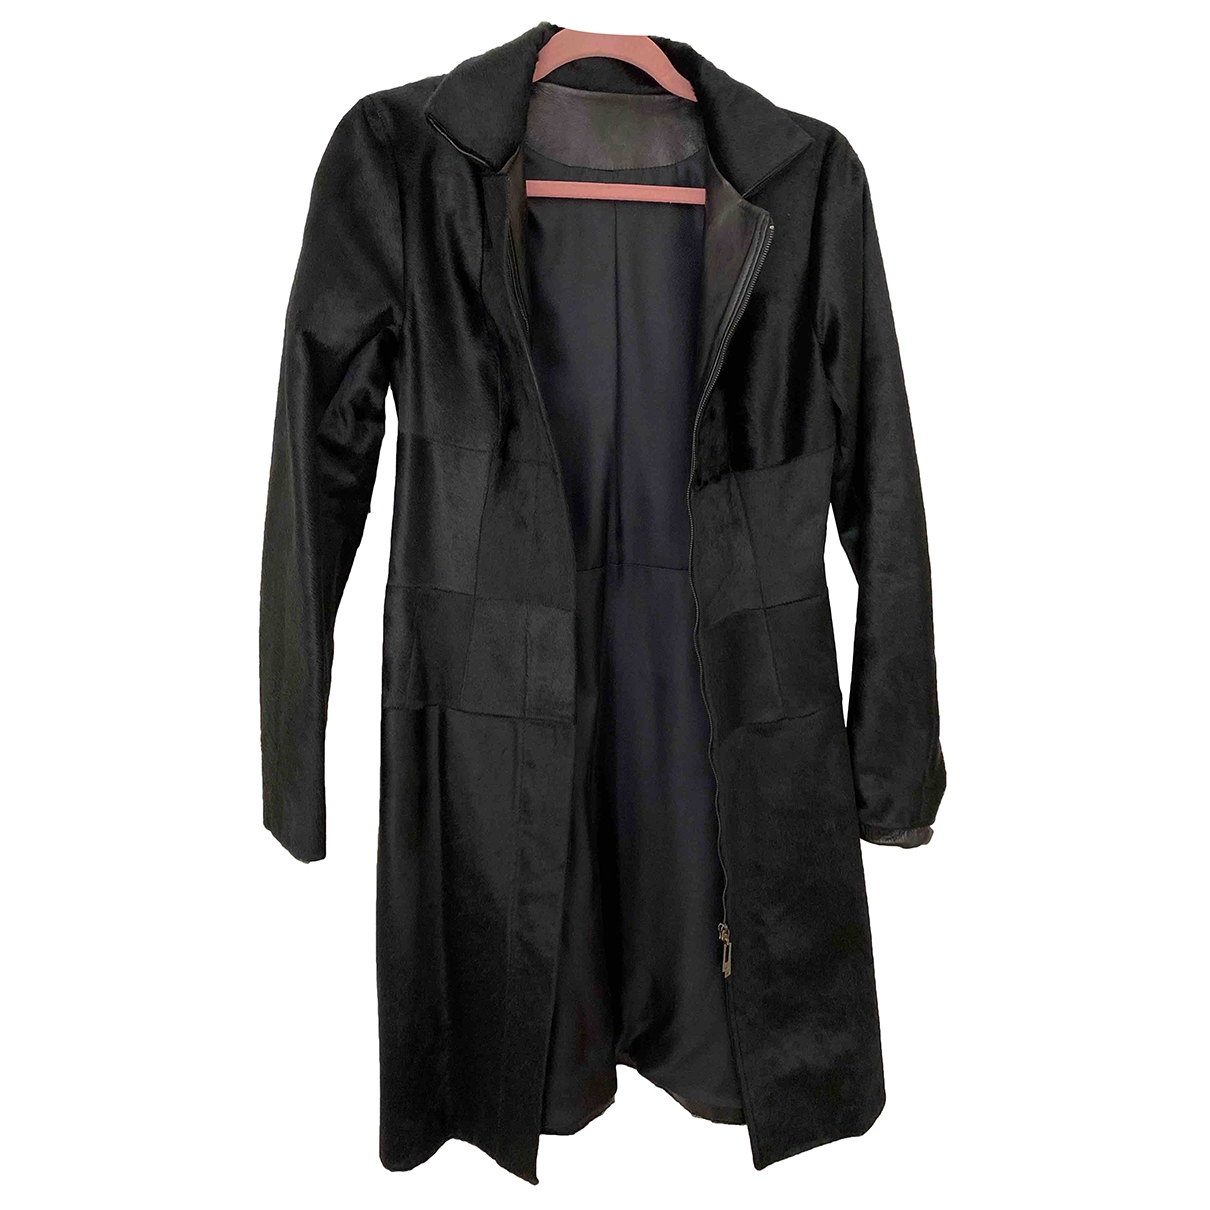 Amanda Wakeley \N Black Fur coat for Women XS International